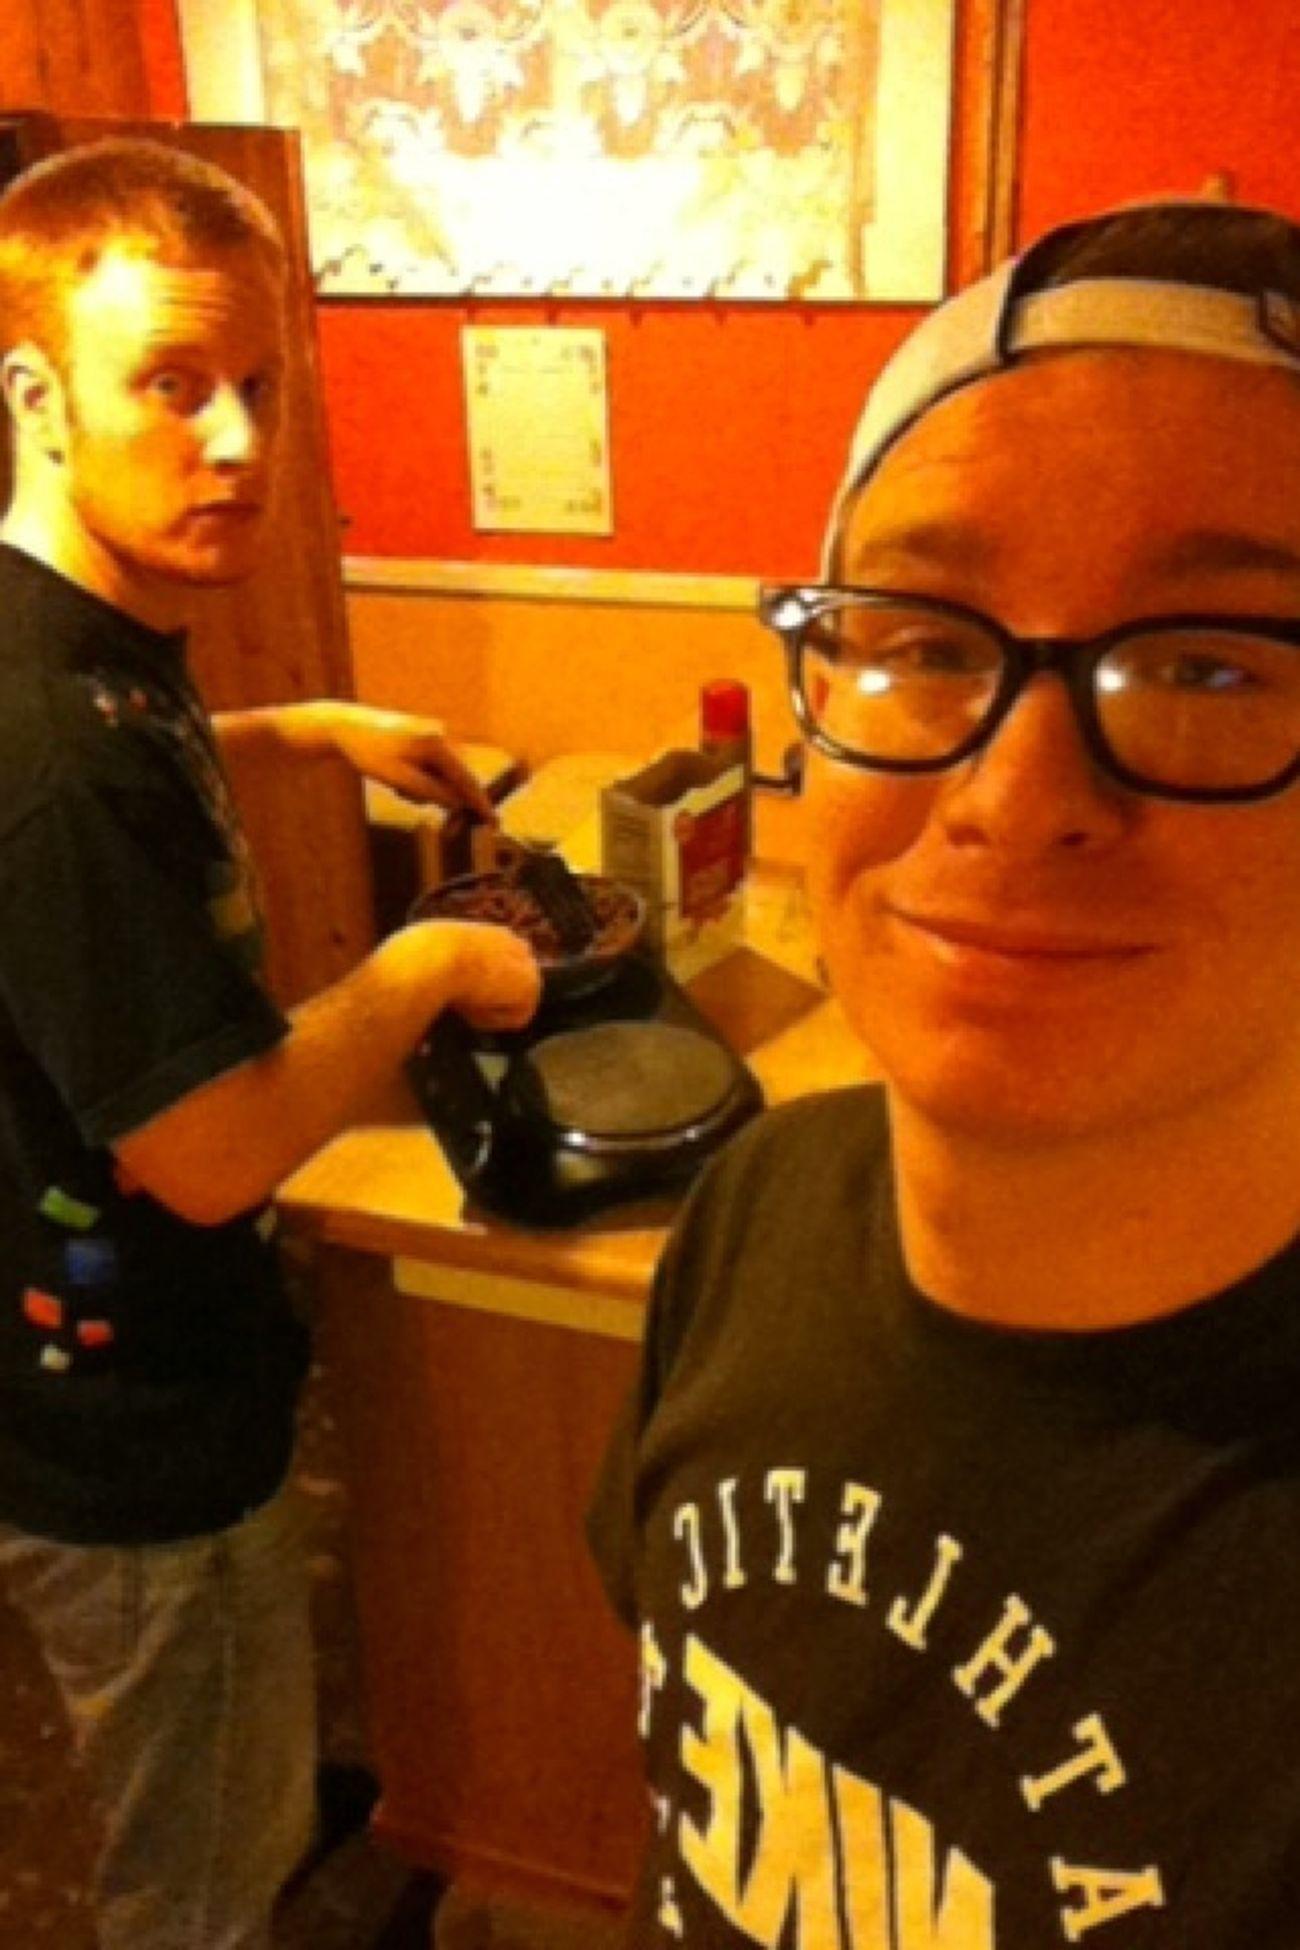 My nigga Jordan cooking some pasta @ 10:36 at night. Hungry status. Friends YoungAndGettingIt Chilling Nofucksgiven